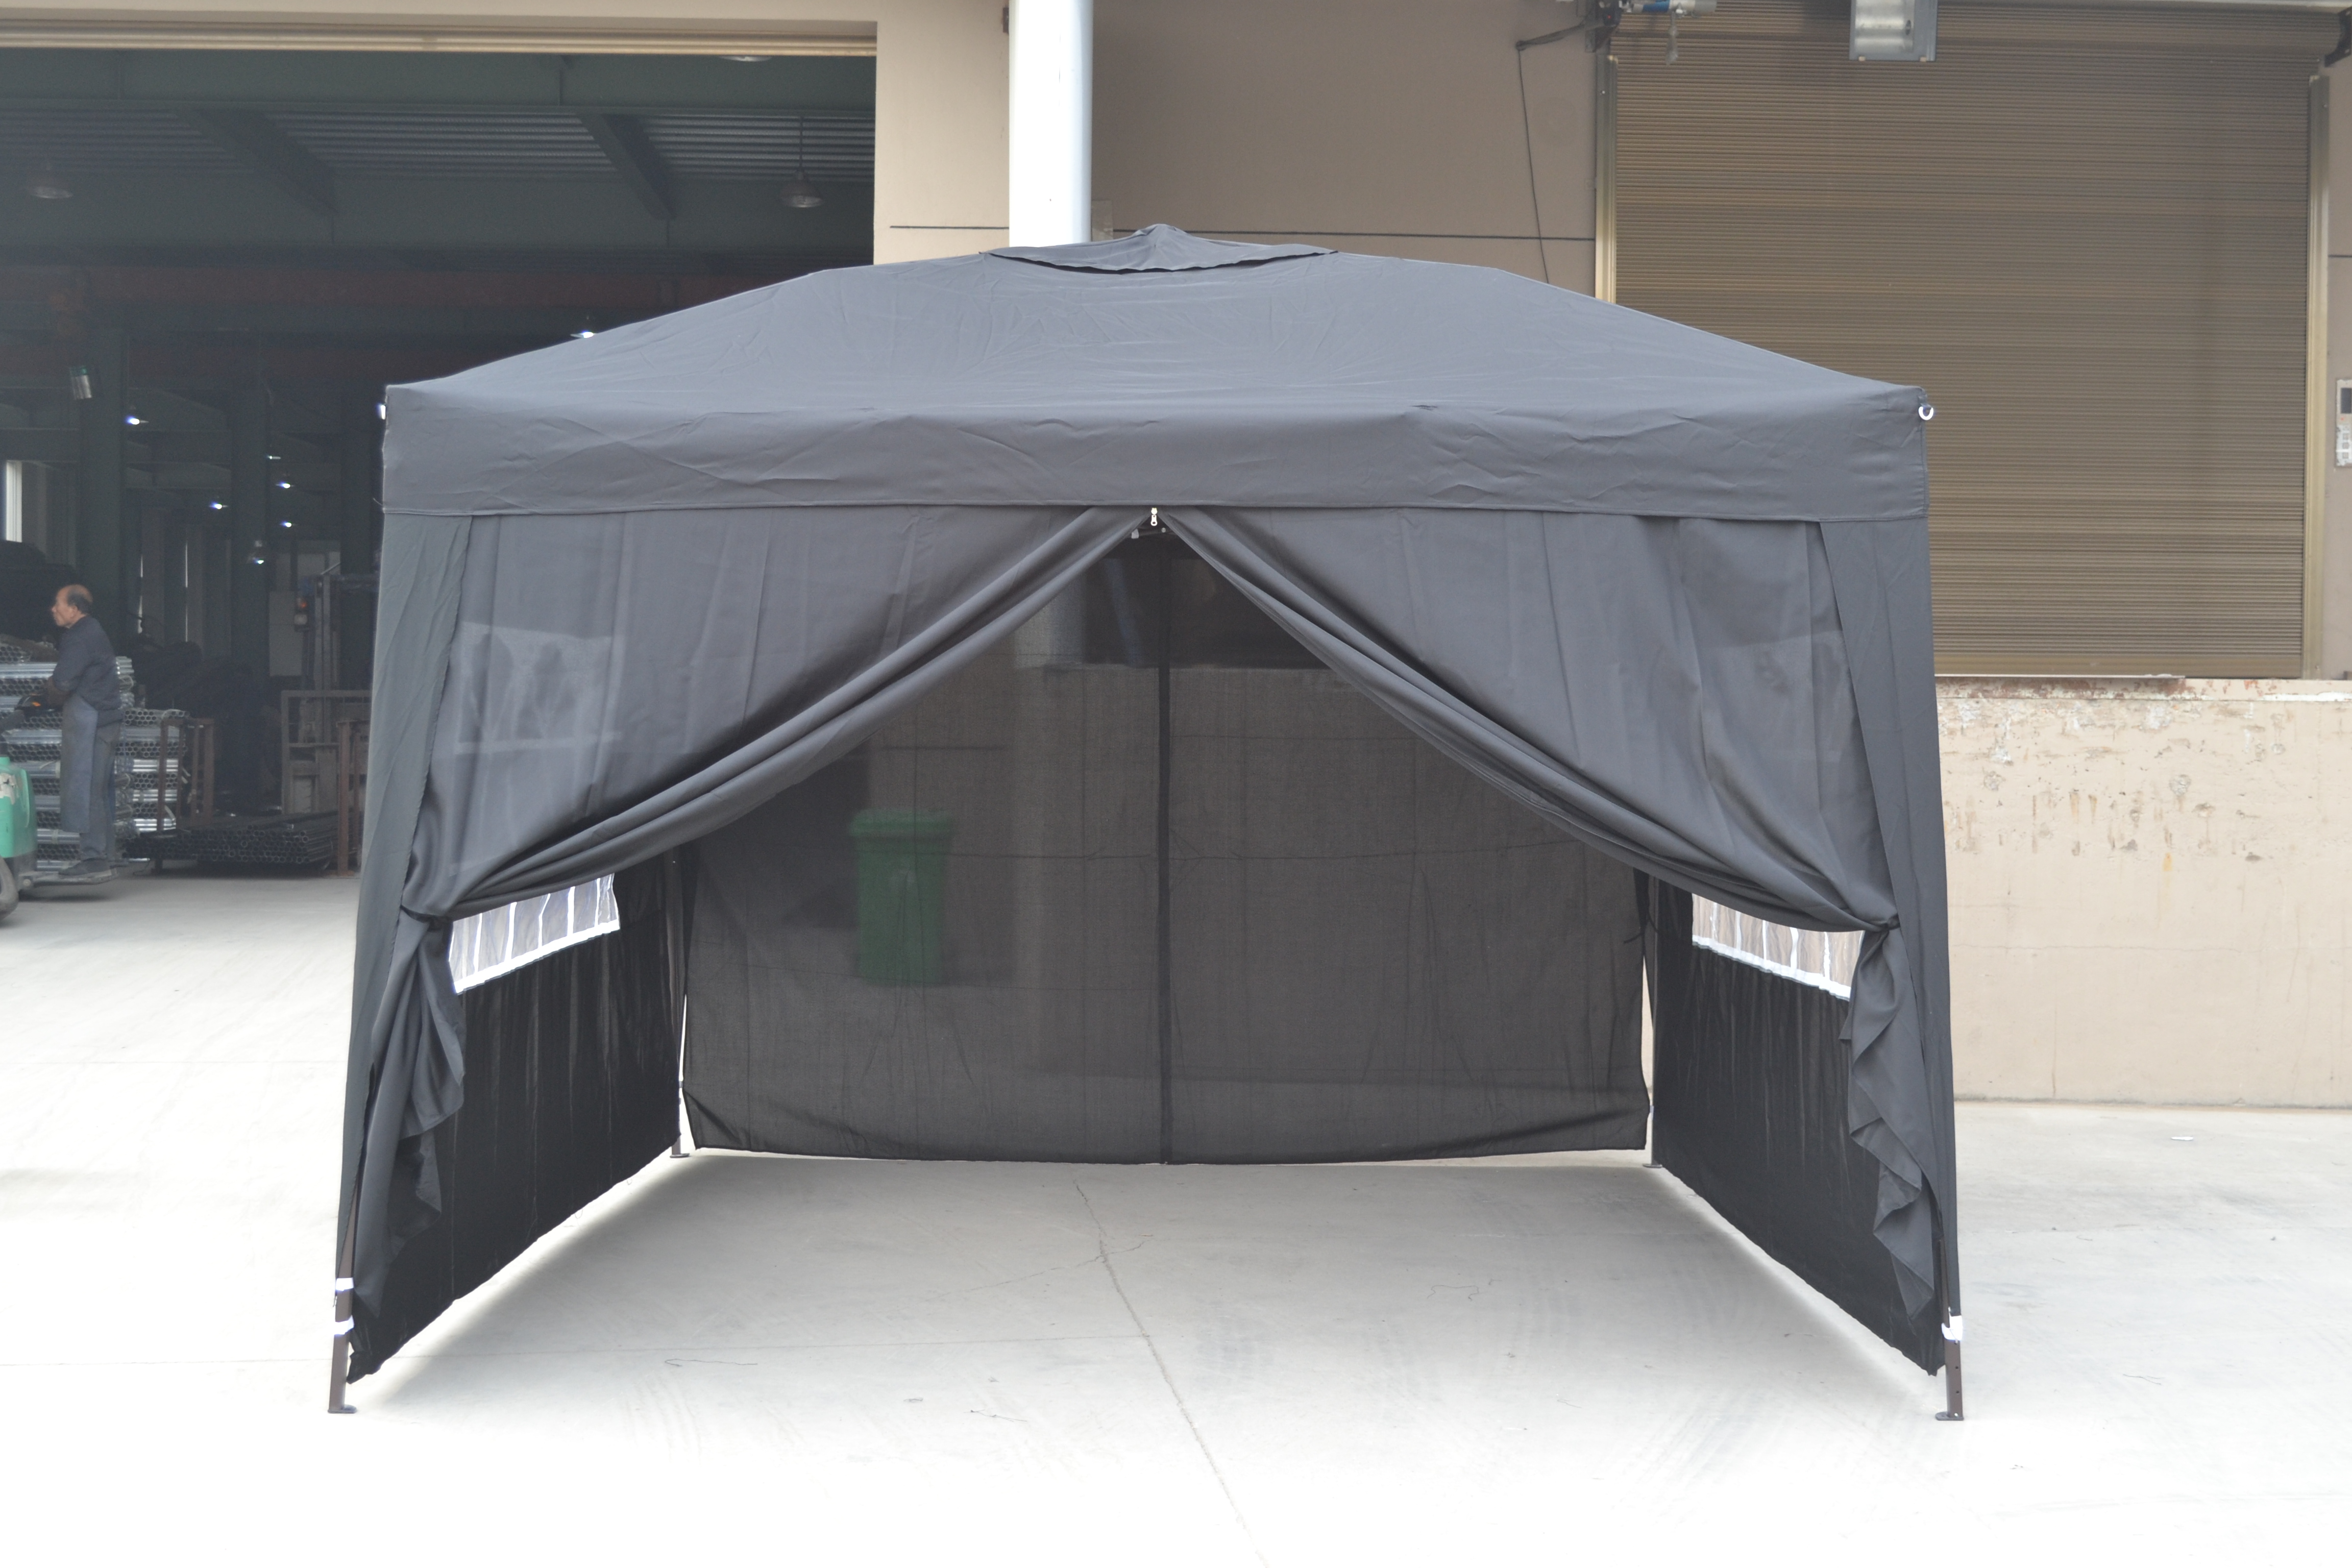 10x10 Ez Pop Up 4 Walls Canopy Party Tent Gazebo With